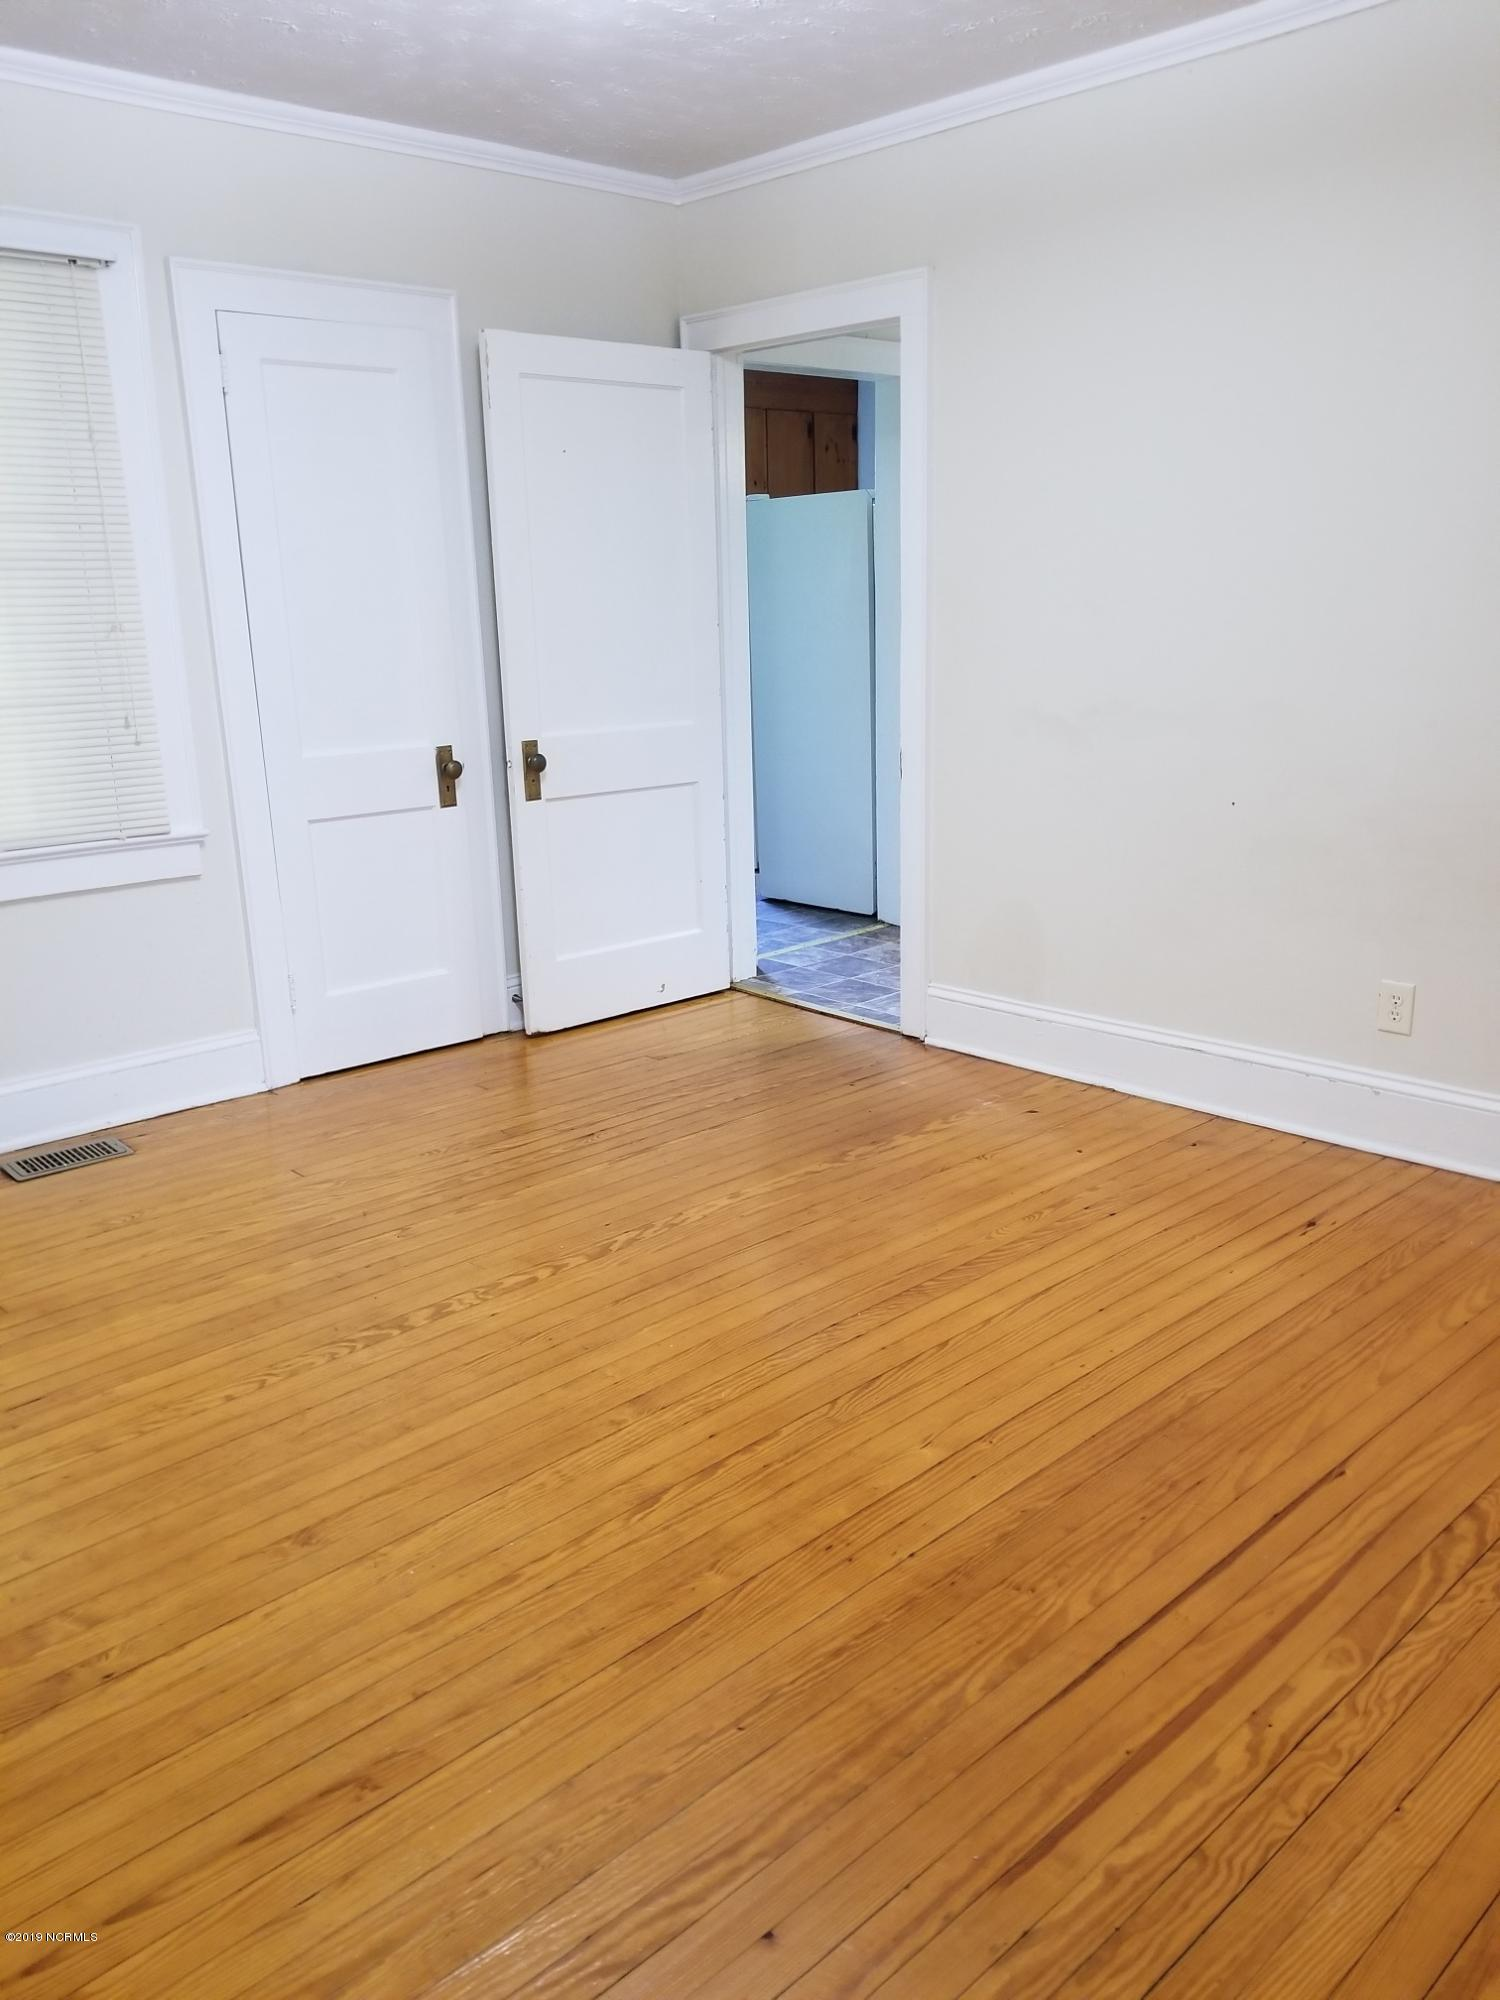 3707 New Bern Highway, Jacksonville, North Carolina 28546, 3 Bedrooms Bedrooms, 9 Rooms Rooms,1 BathroomBathrooms,Single family residence,For sale,New Bern,100174120